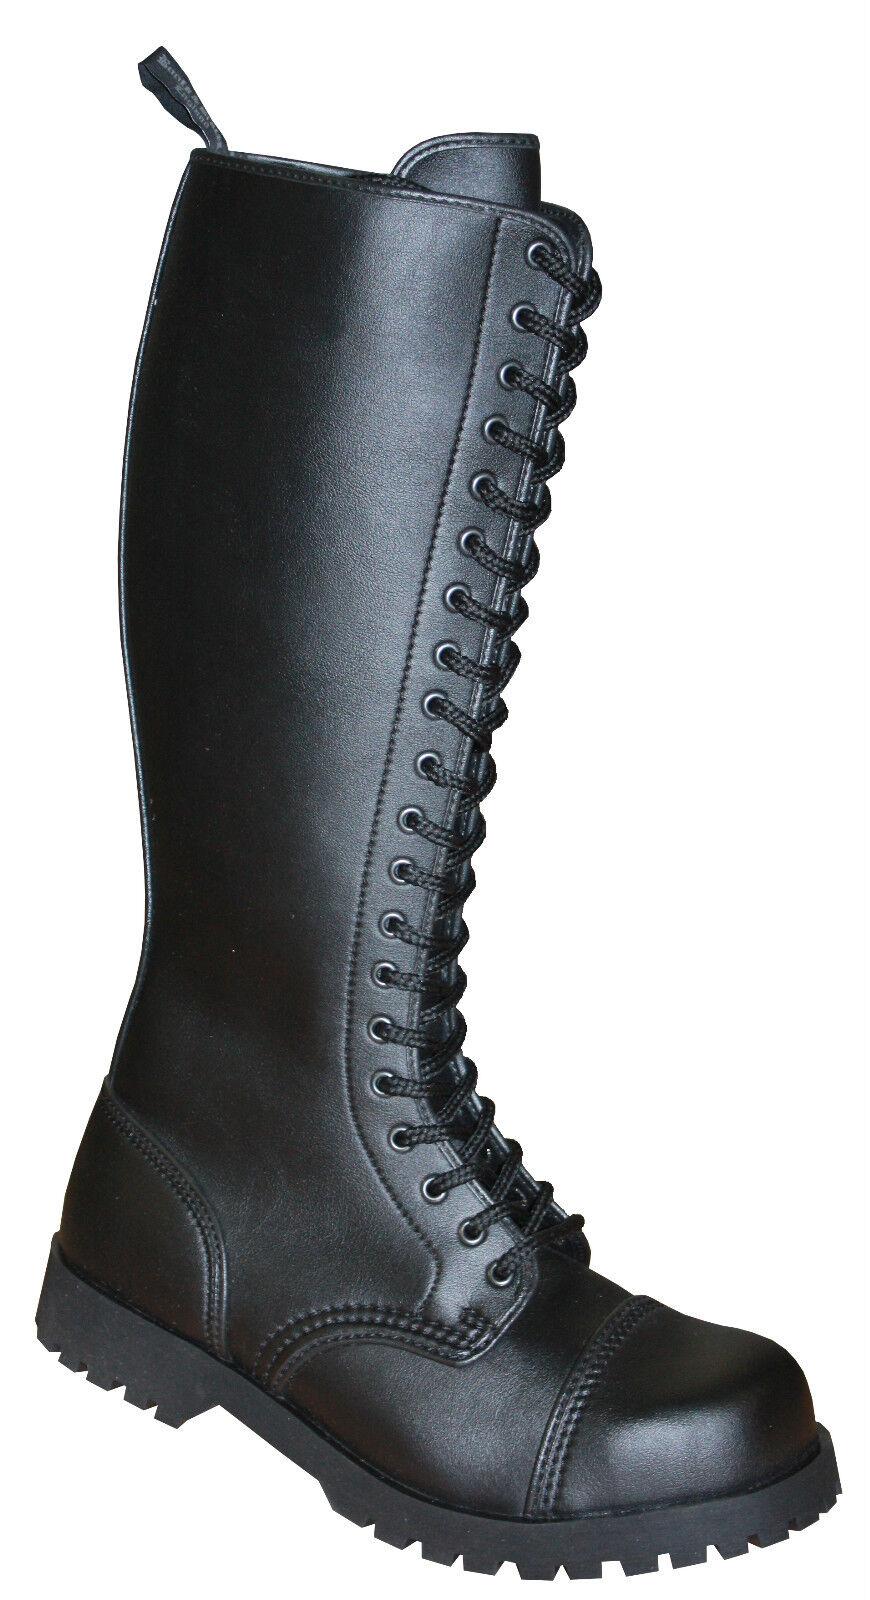 botas & & & BRACES 20 agujero vegetariano Vegi botas y Rangers Negras Nueva  tienda en linea